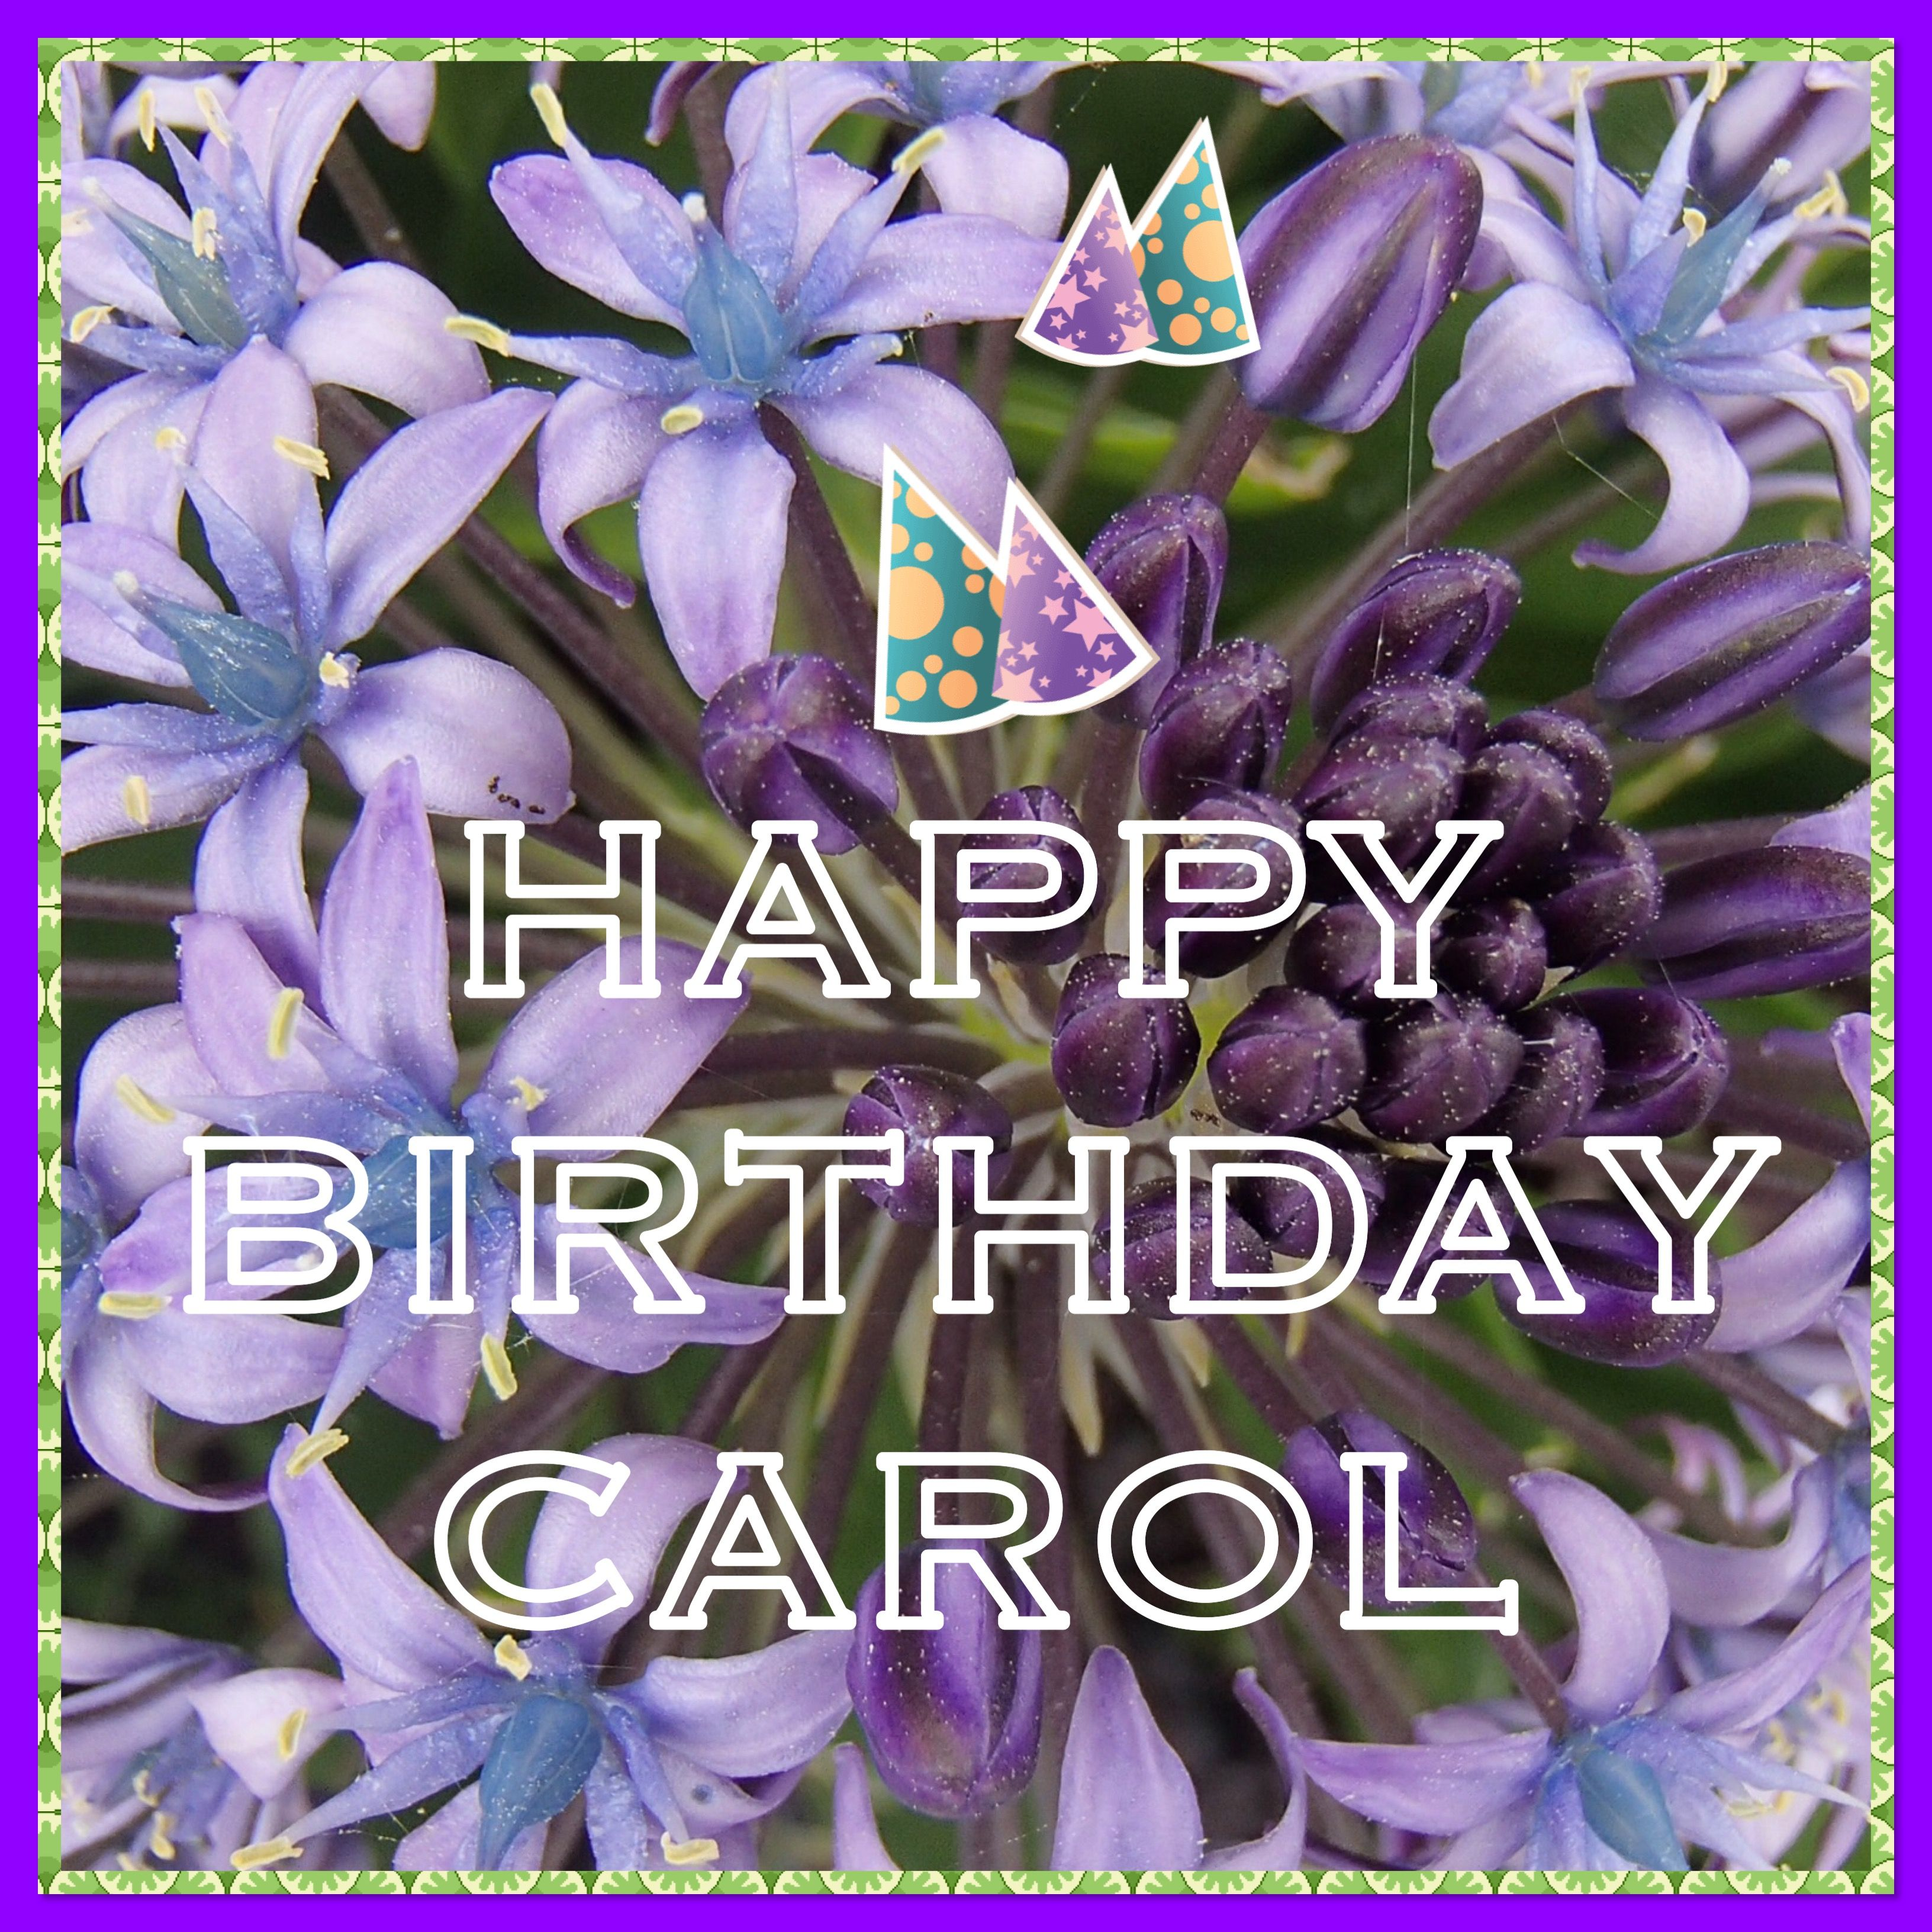 happy birthday carol happy birthday memes pinterest birthday memes happy birthday memes. Black Bedroom Furniture Sets. Home Design Ideas